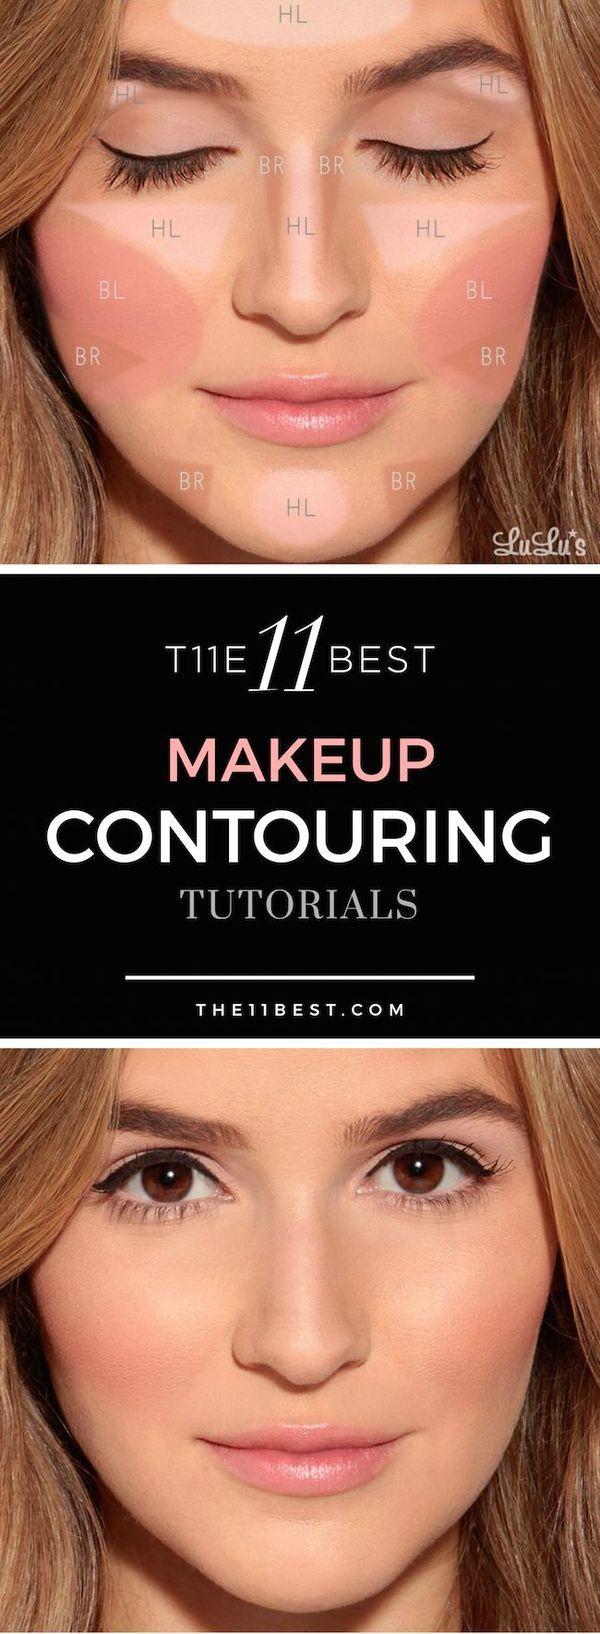 239 best contour tutorials images on pinterest make up looks the 11 best makeup contouring tutorials baditri Gallery